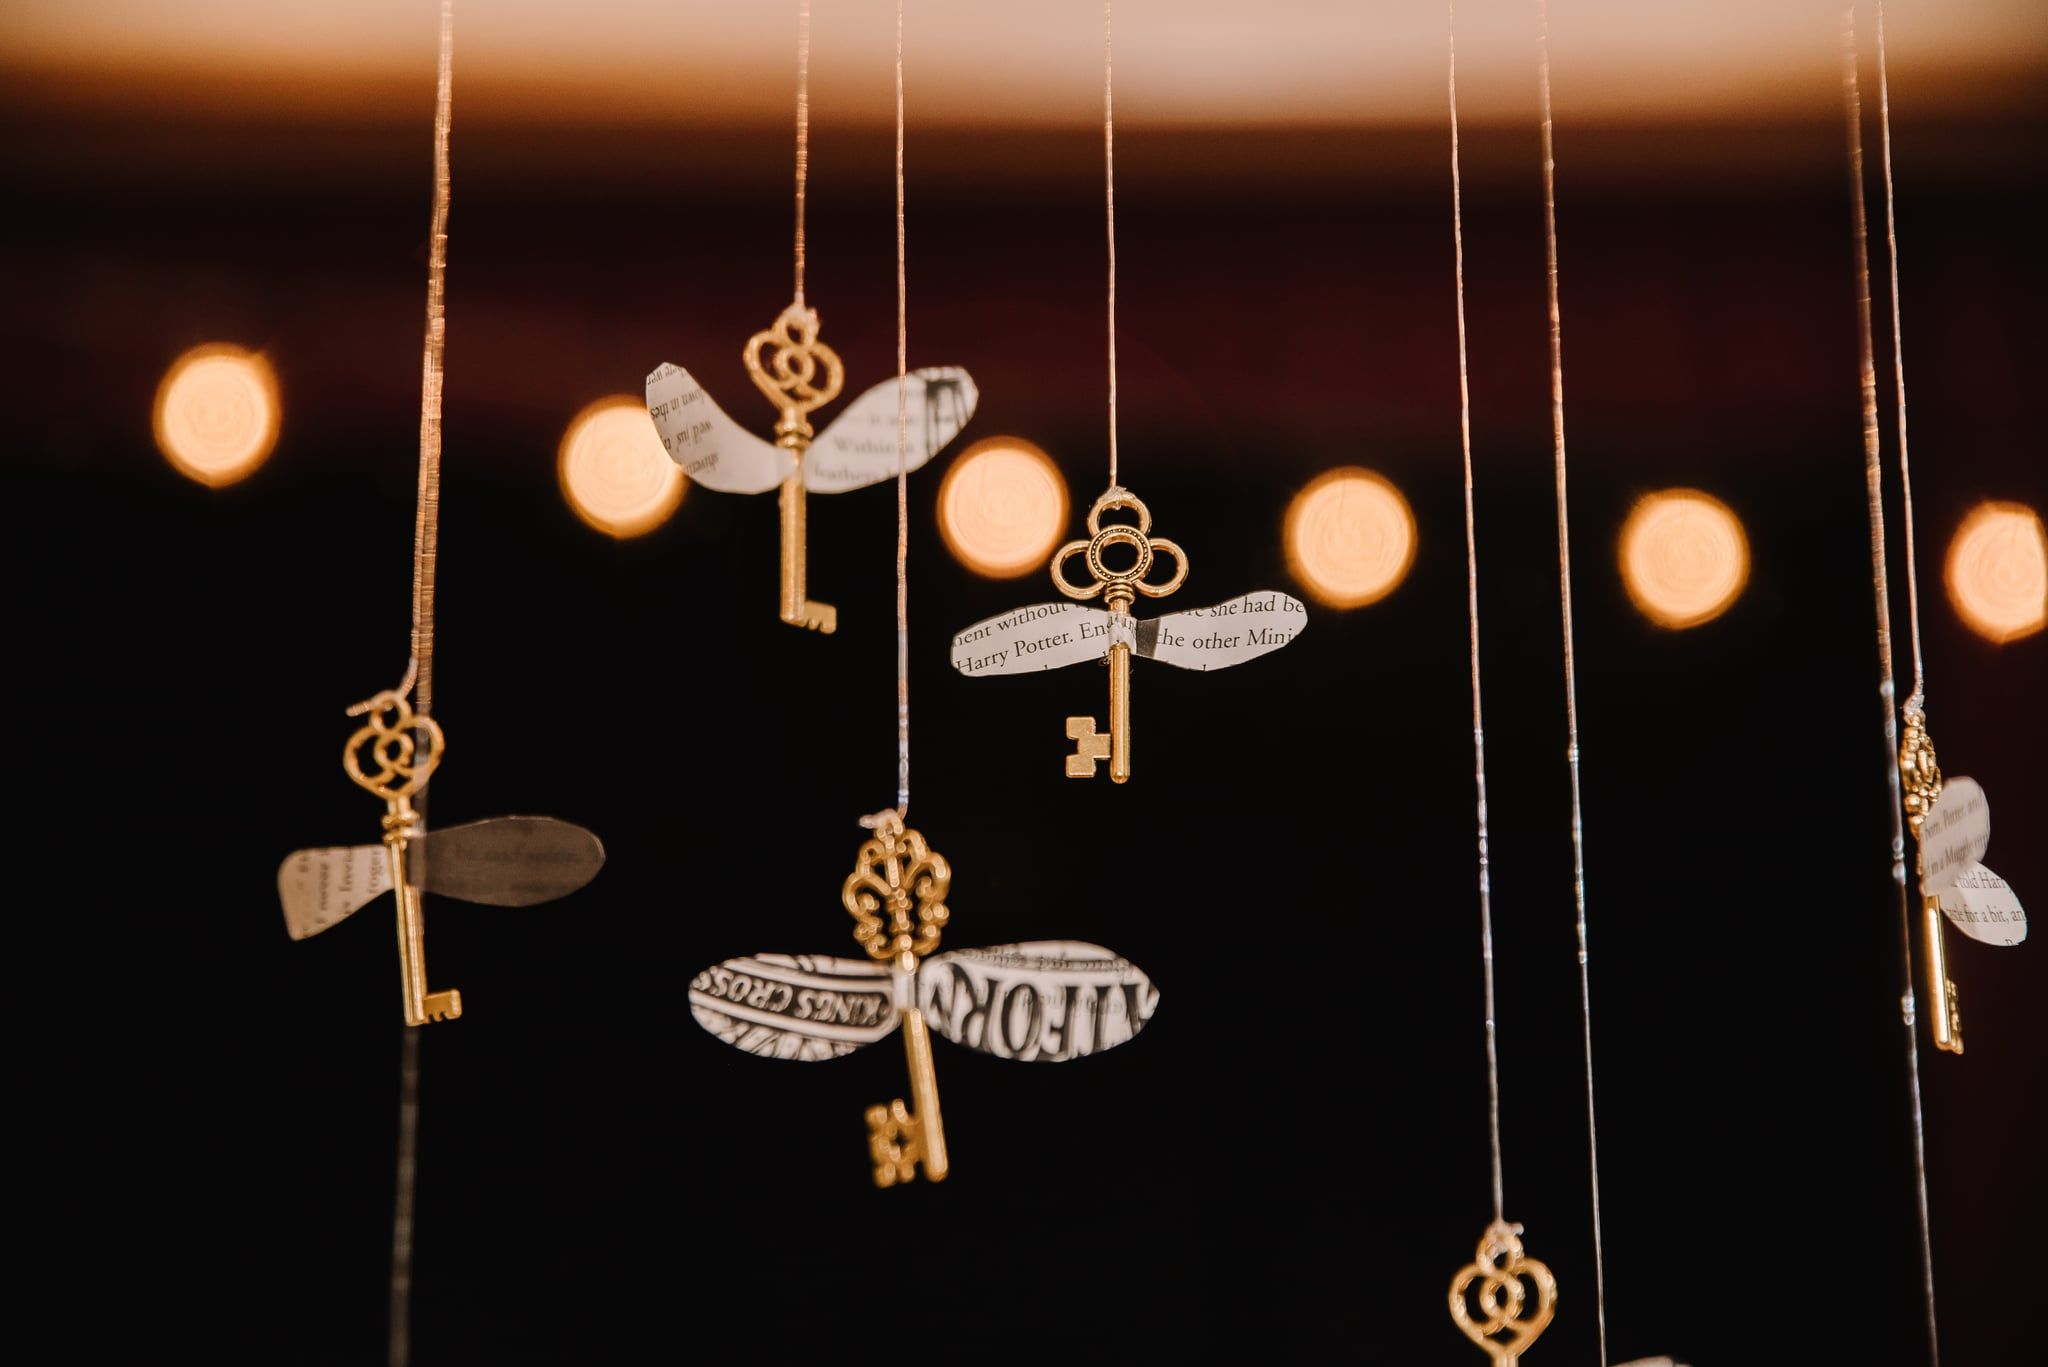 Alohomora! This Romantic Harry Potter Wedding Shoot Has the Flying Key to My Heart